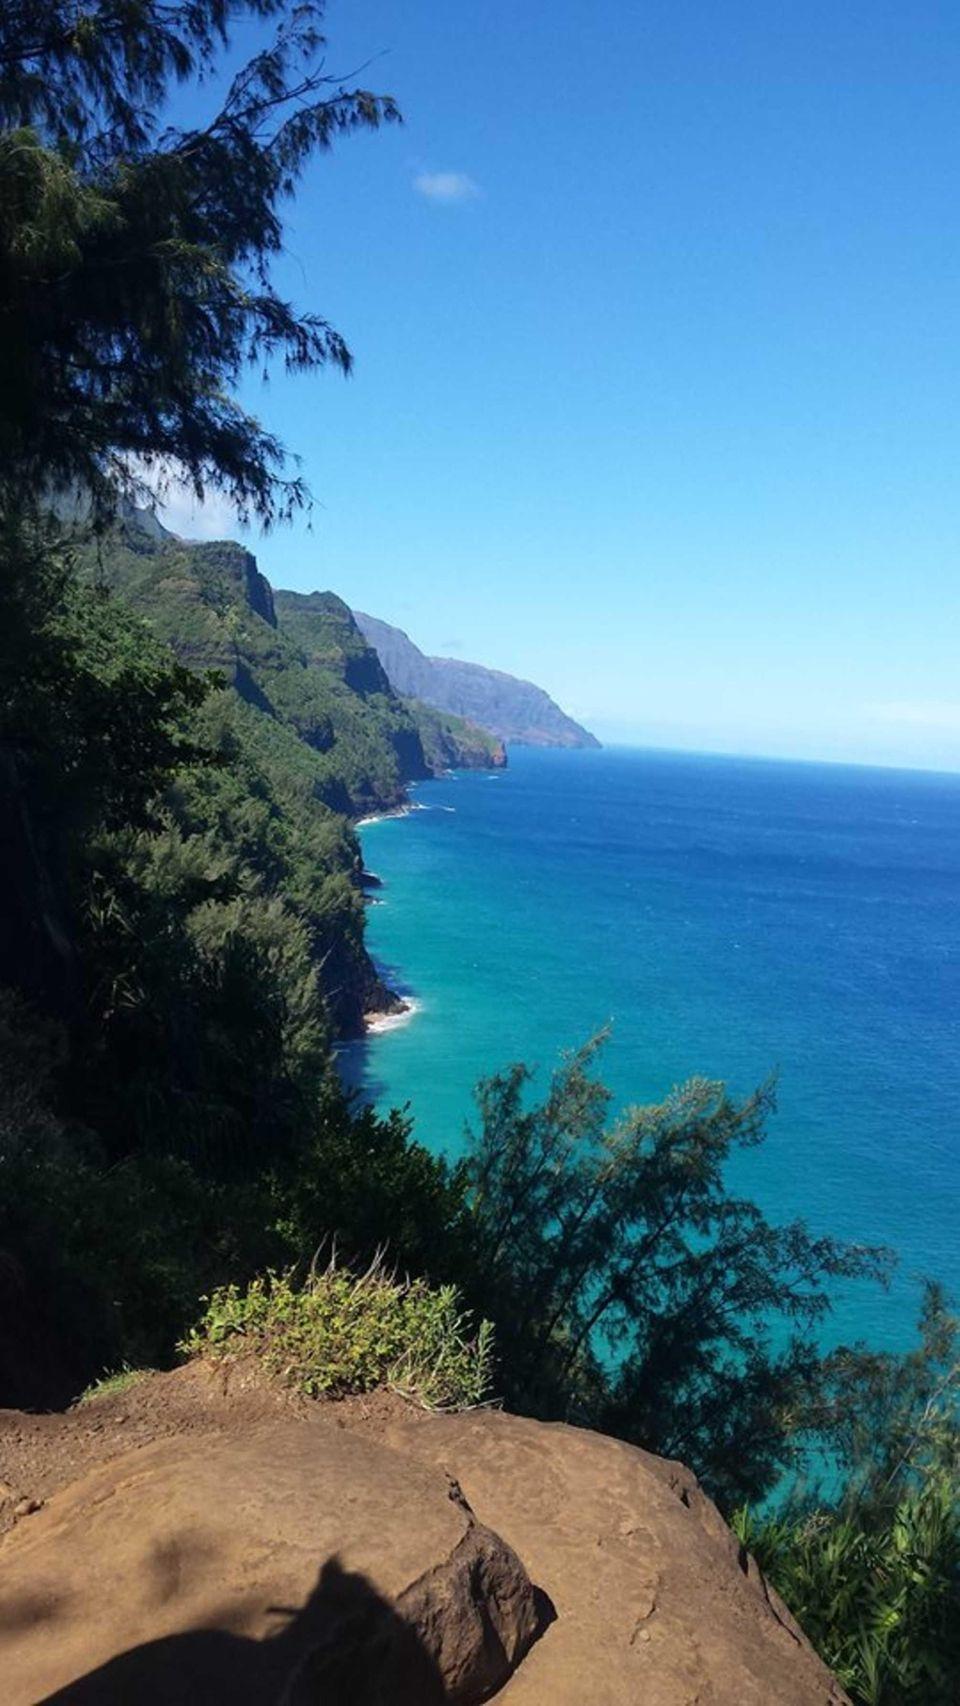 Hiking to Hanakapiai Beach on the Napali Coast,